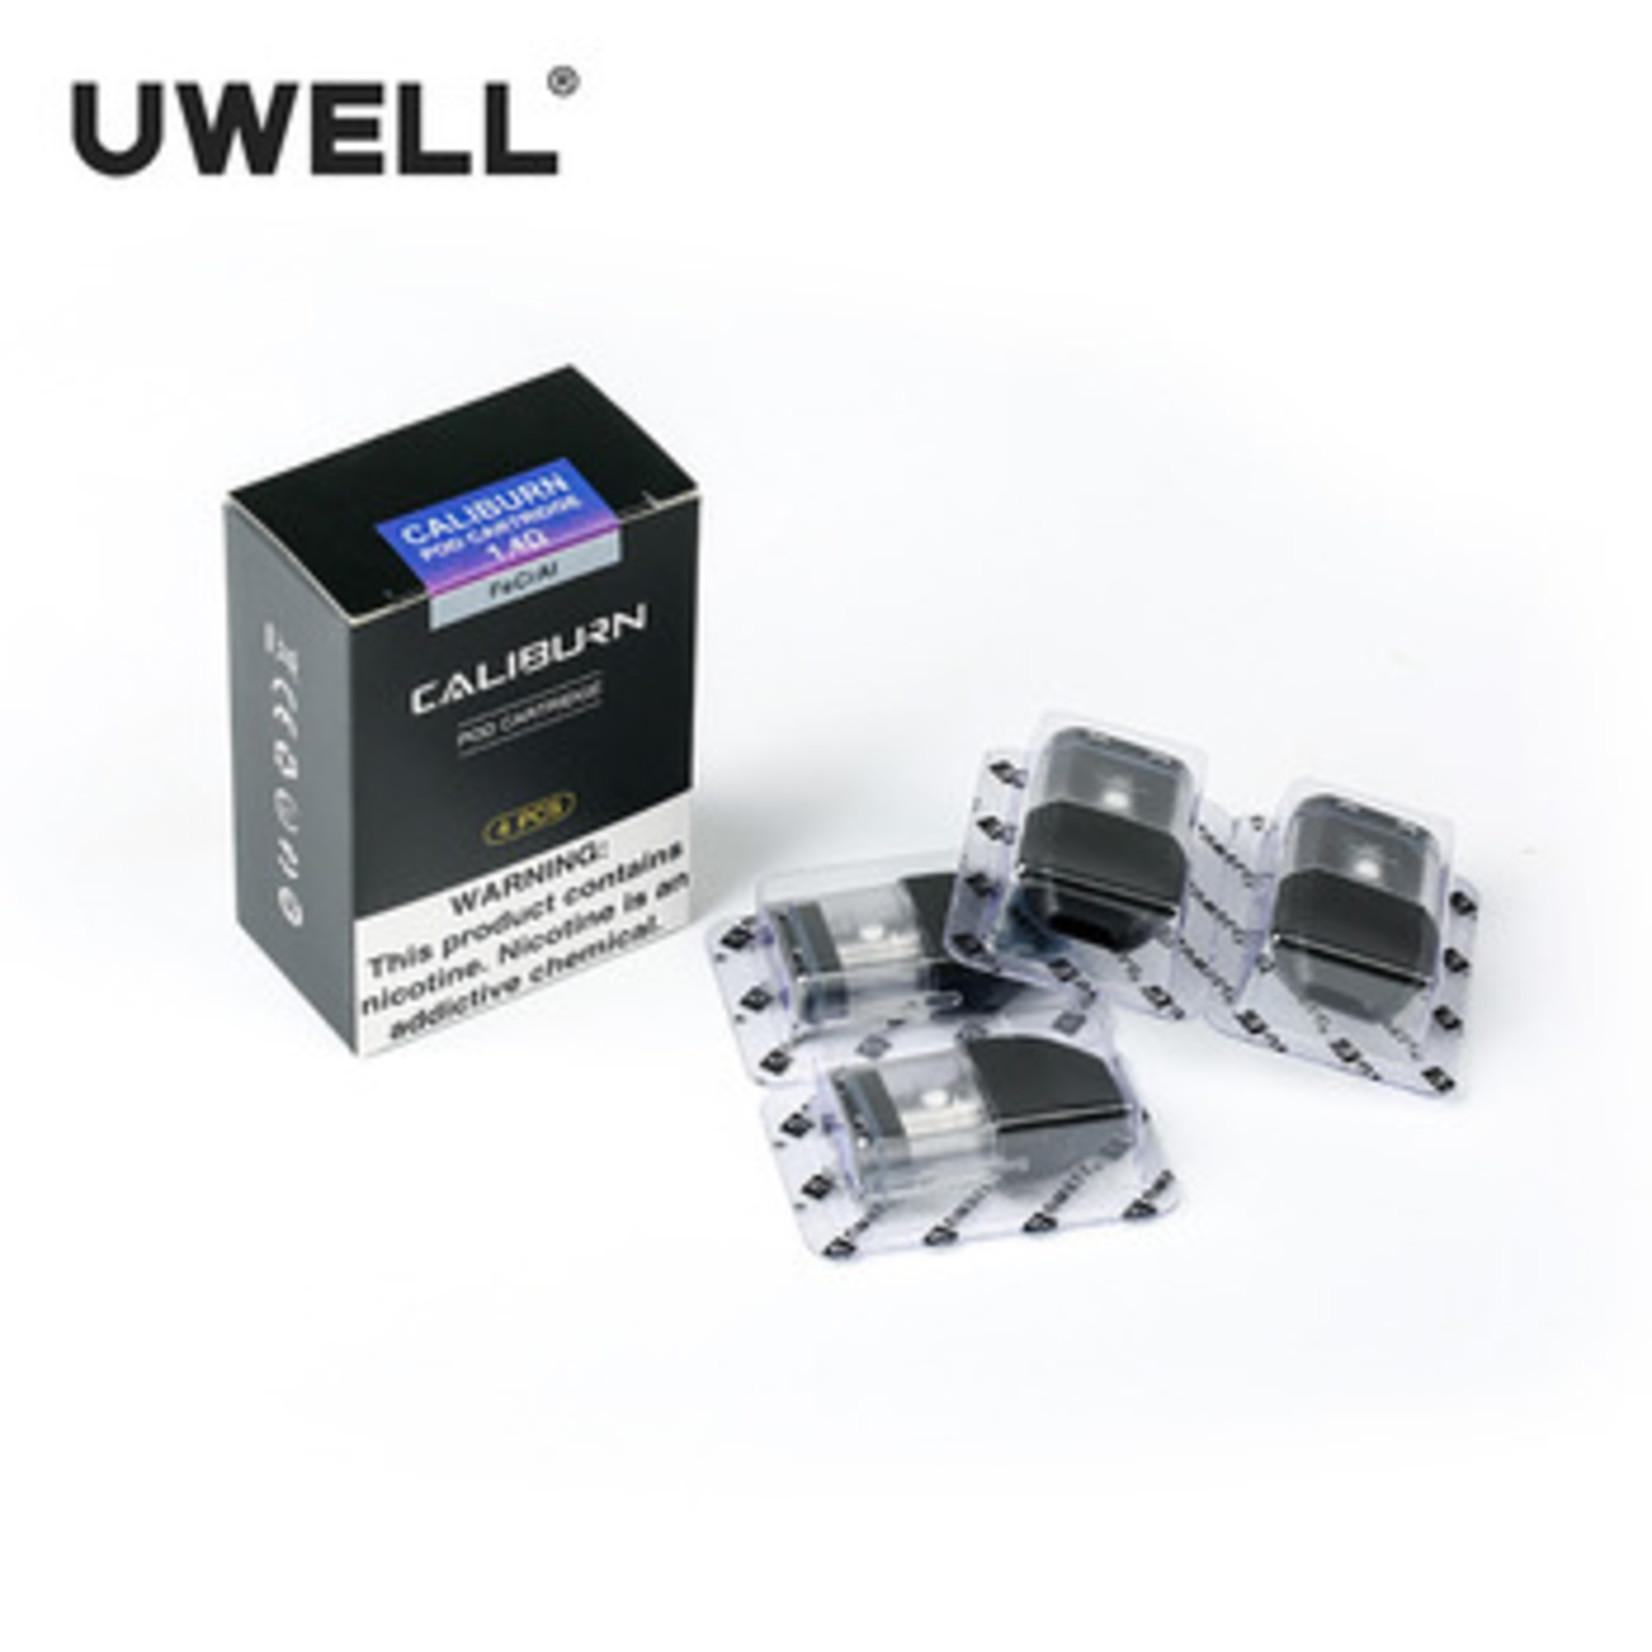 Uwell Caliburn/KoKo Pods 4-Pack